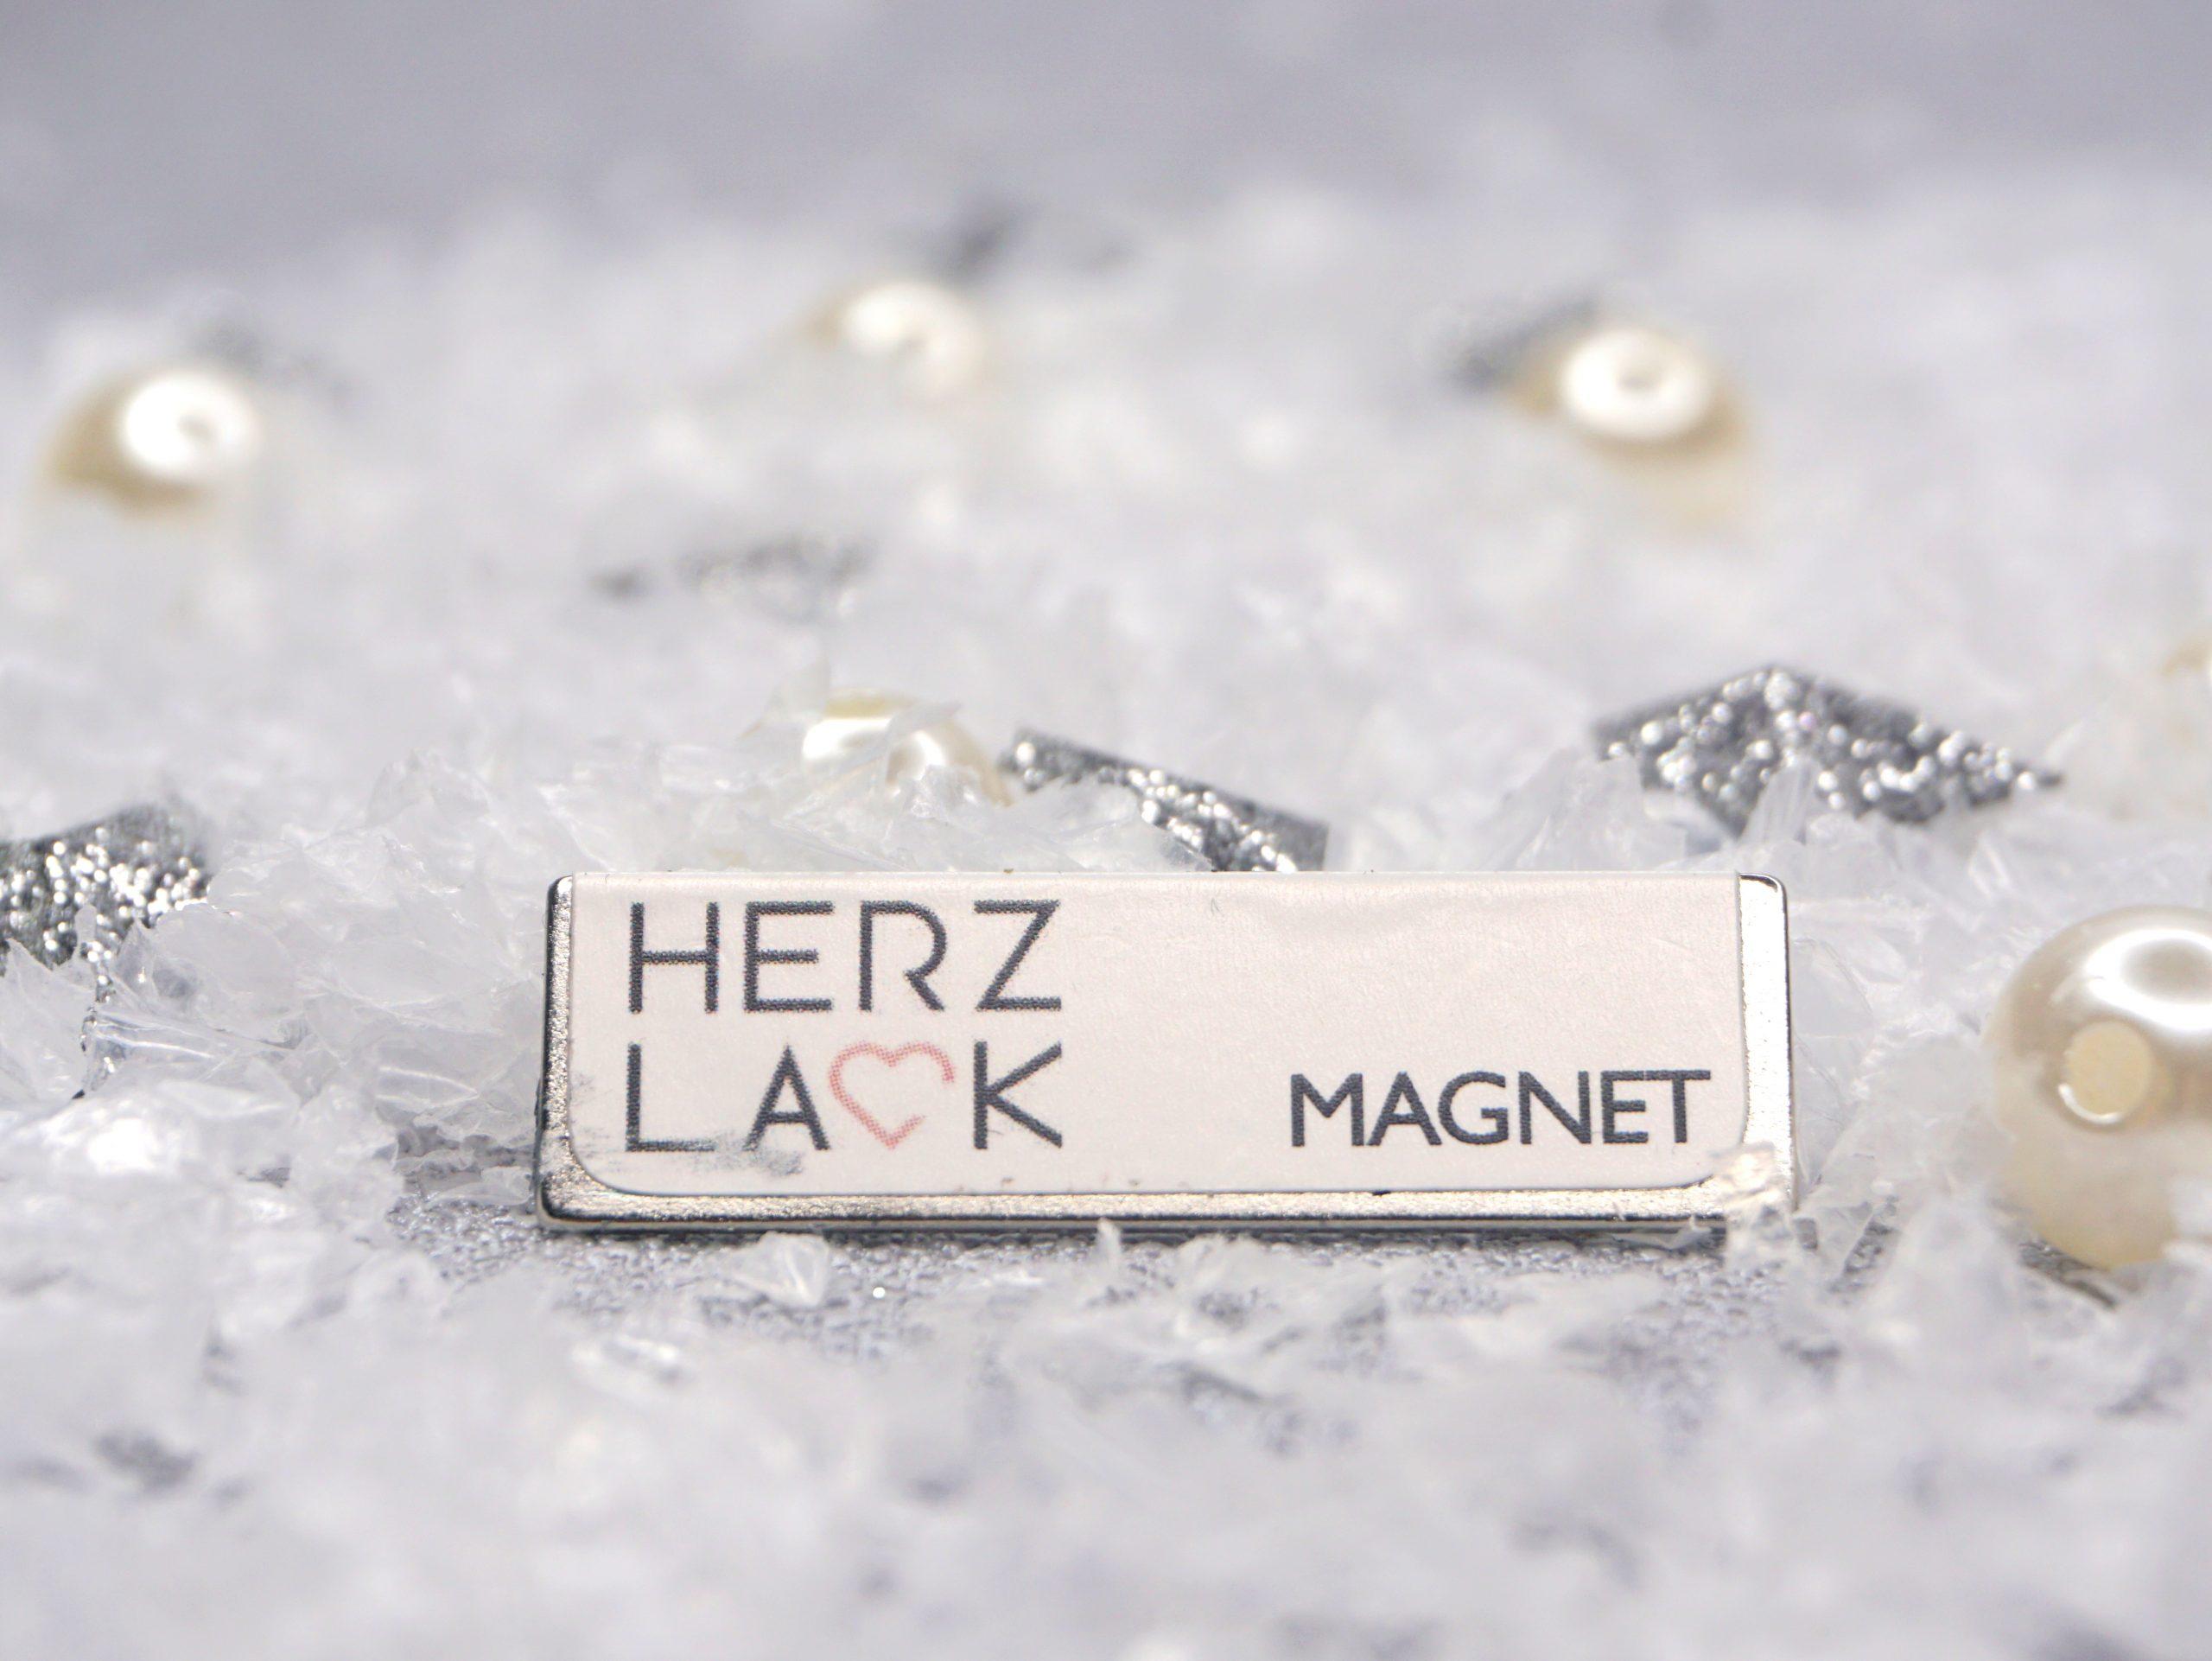 Herzlack Adventskalender Magnet